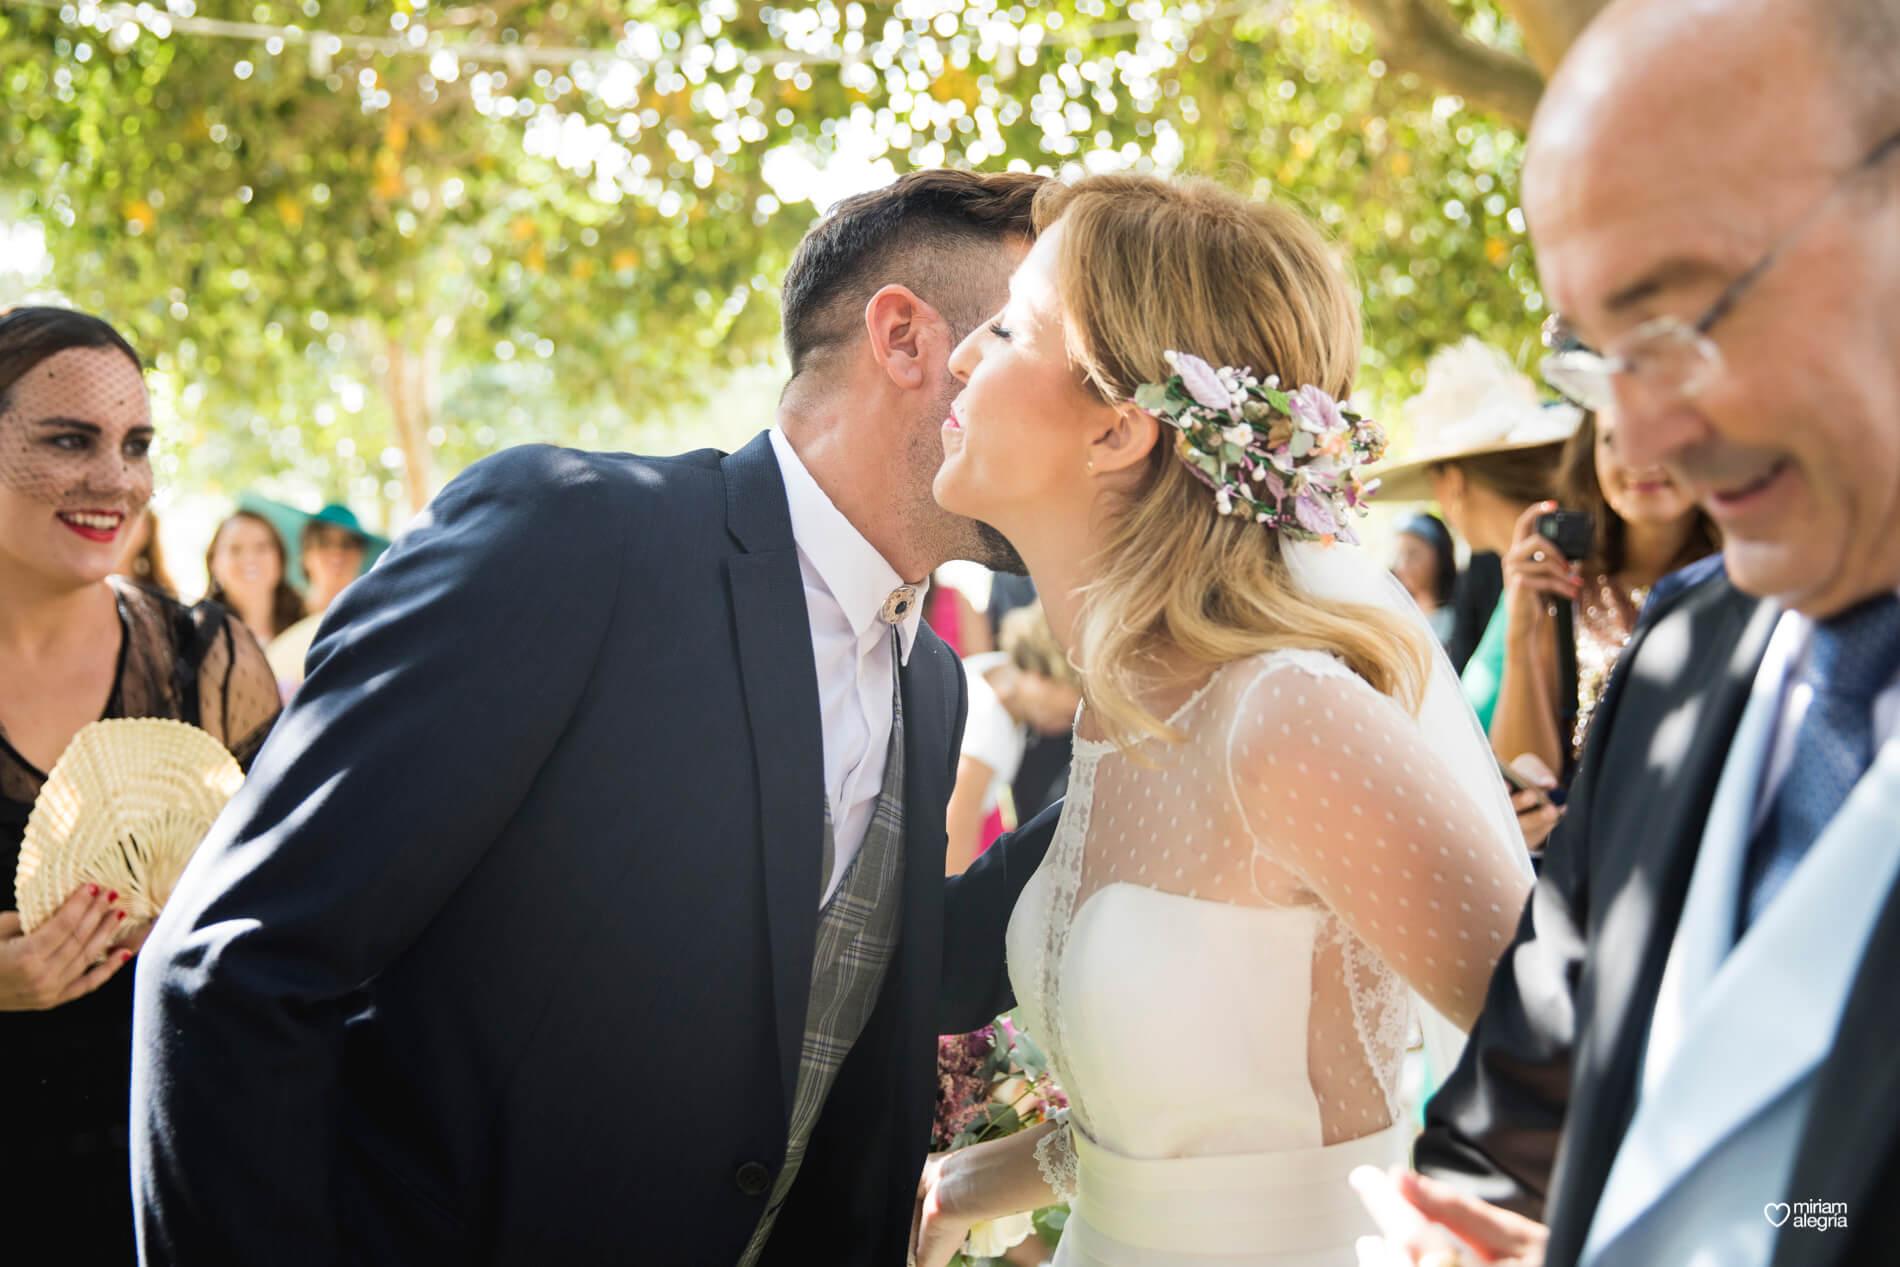 la-boda-de-alemc7-miriam-alegria-fotografos-boda-murcia-43